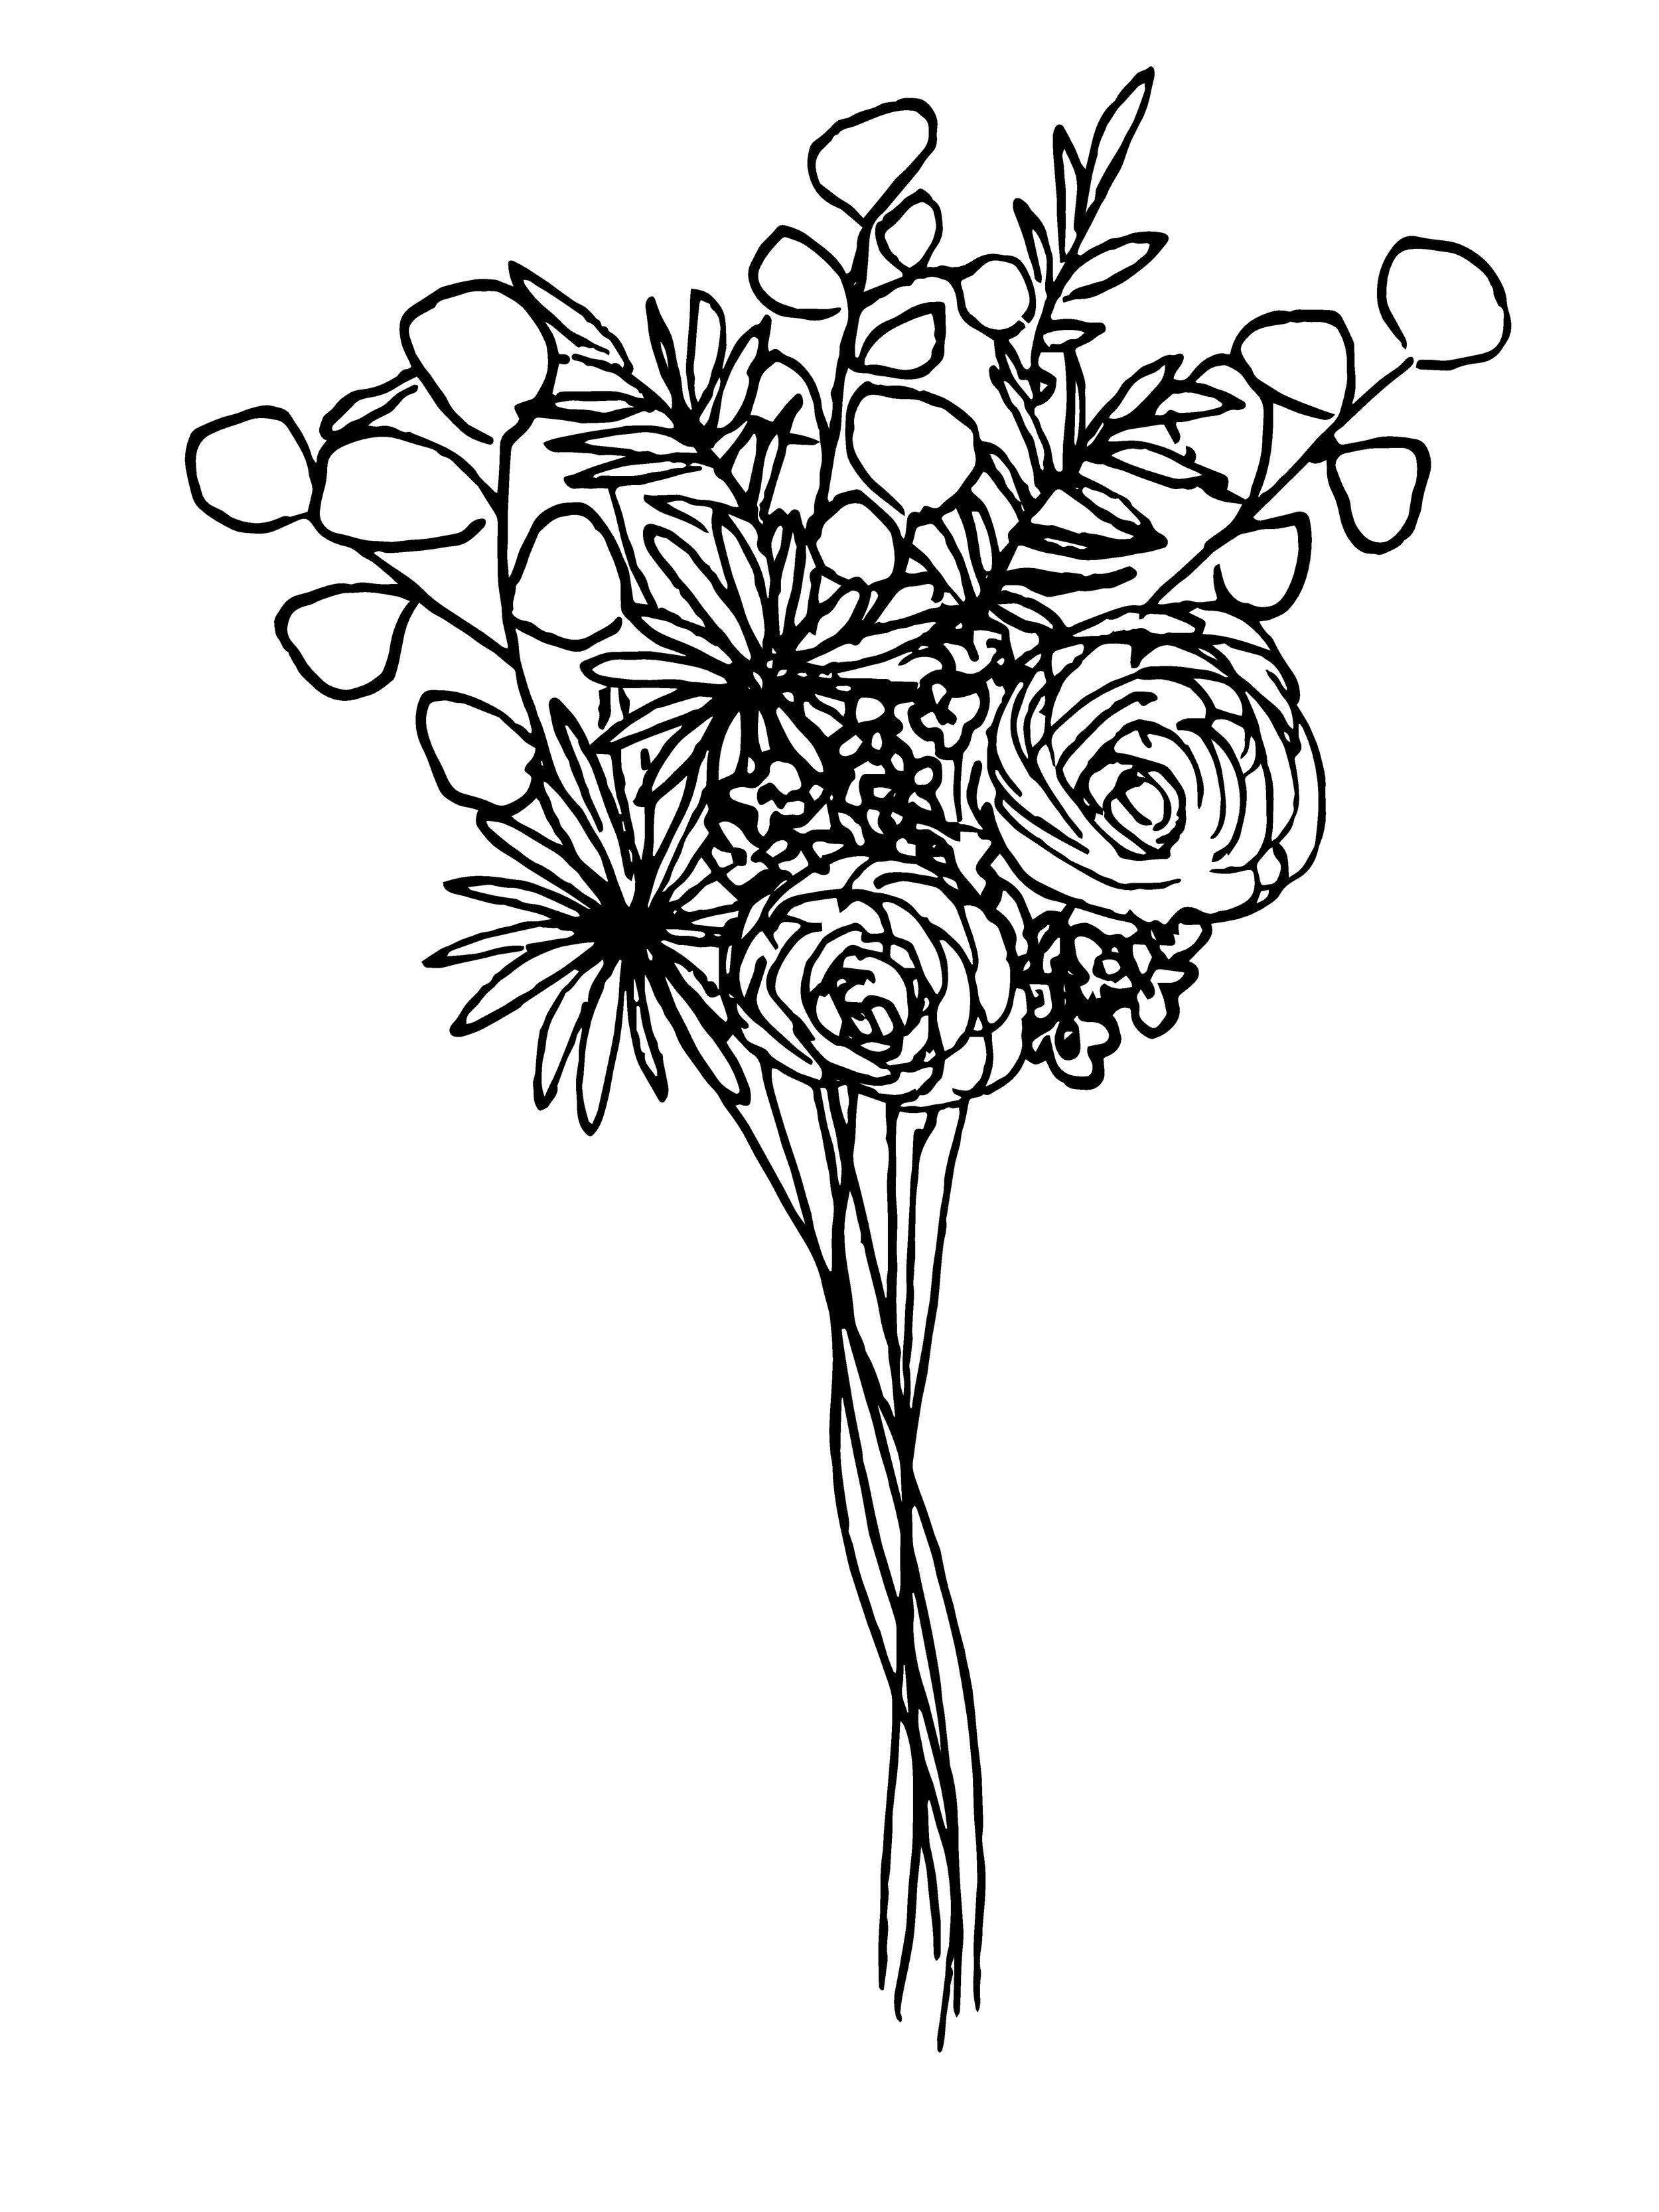 Sarah Pluta Art-page-003.jpg